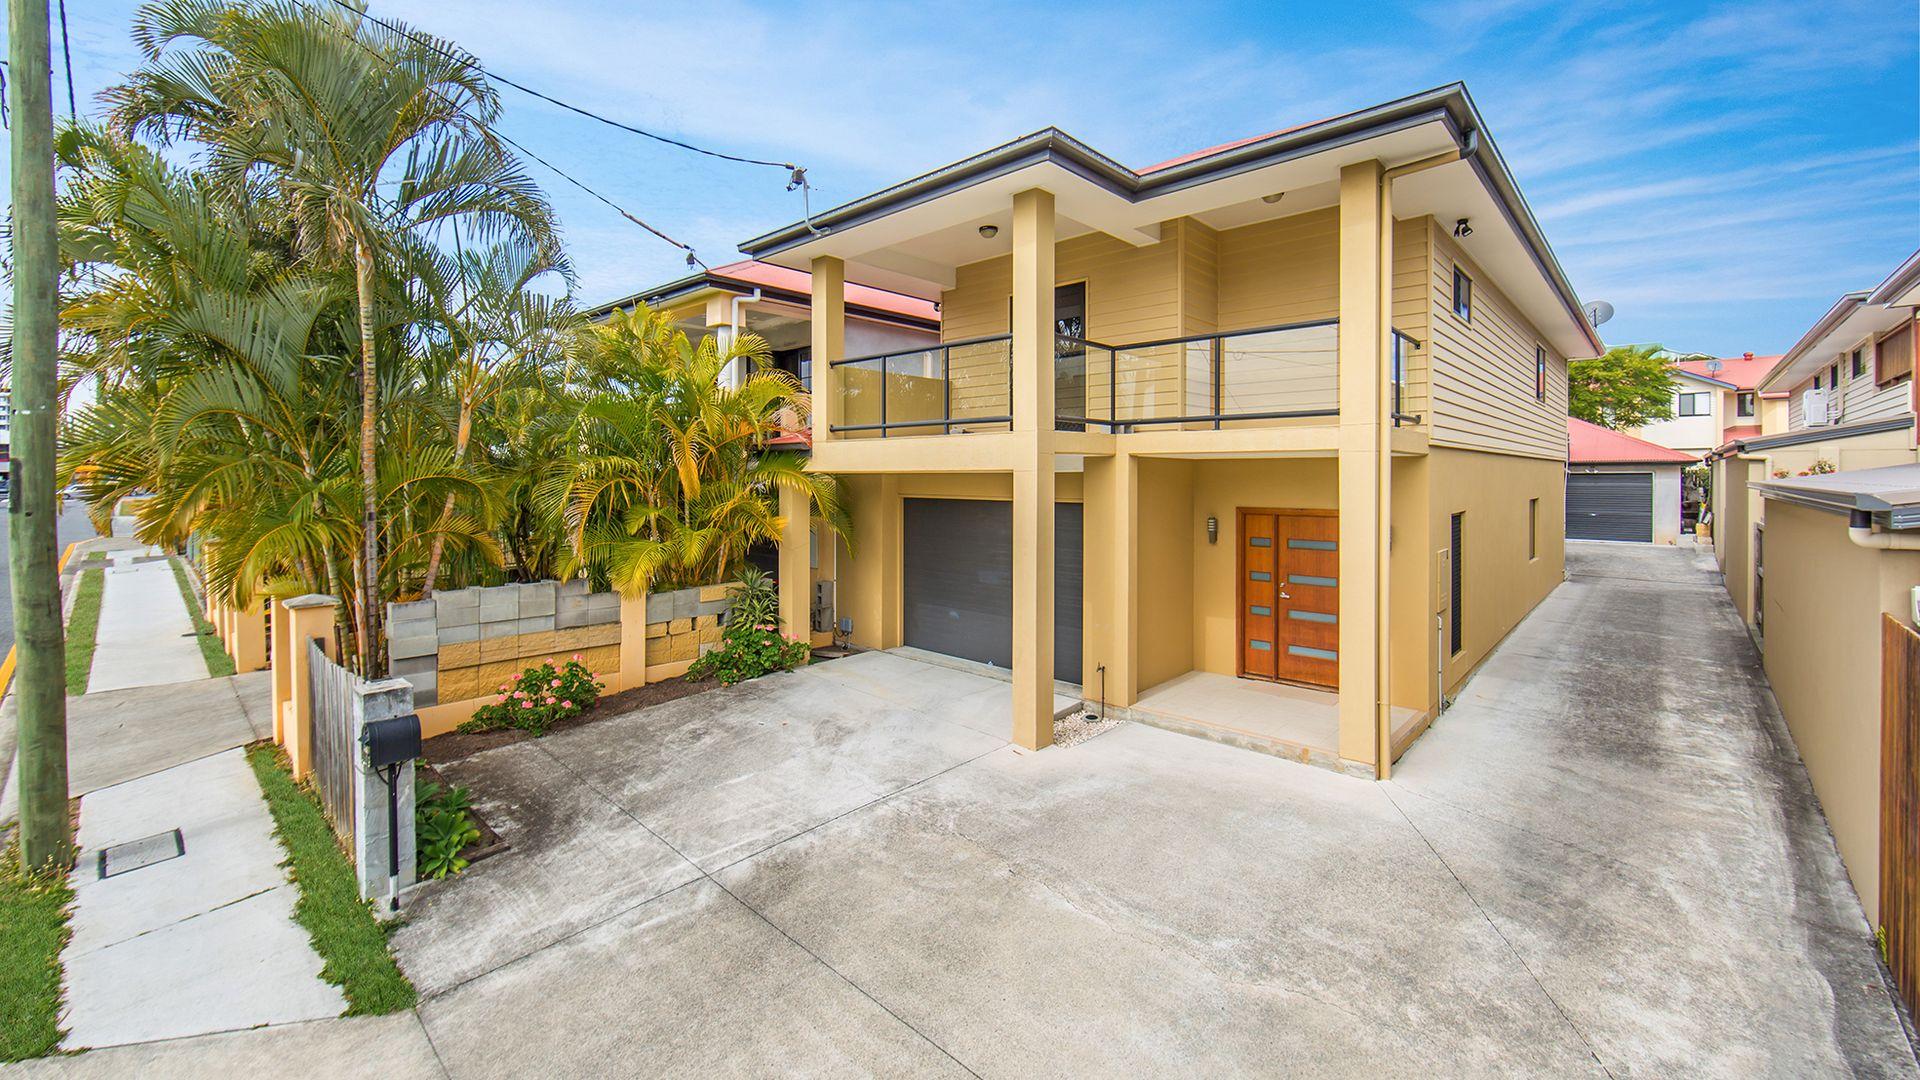 20 & 22 Sparkes Street, Chermside QLD 4032, Image 1